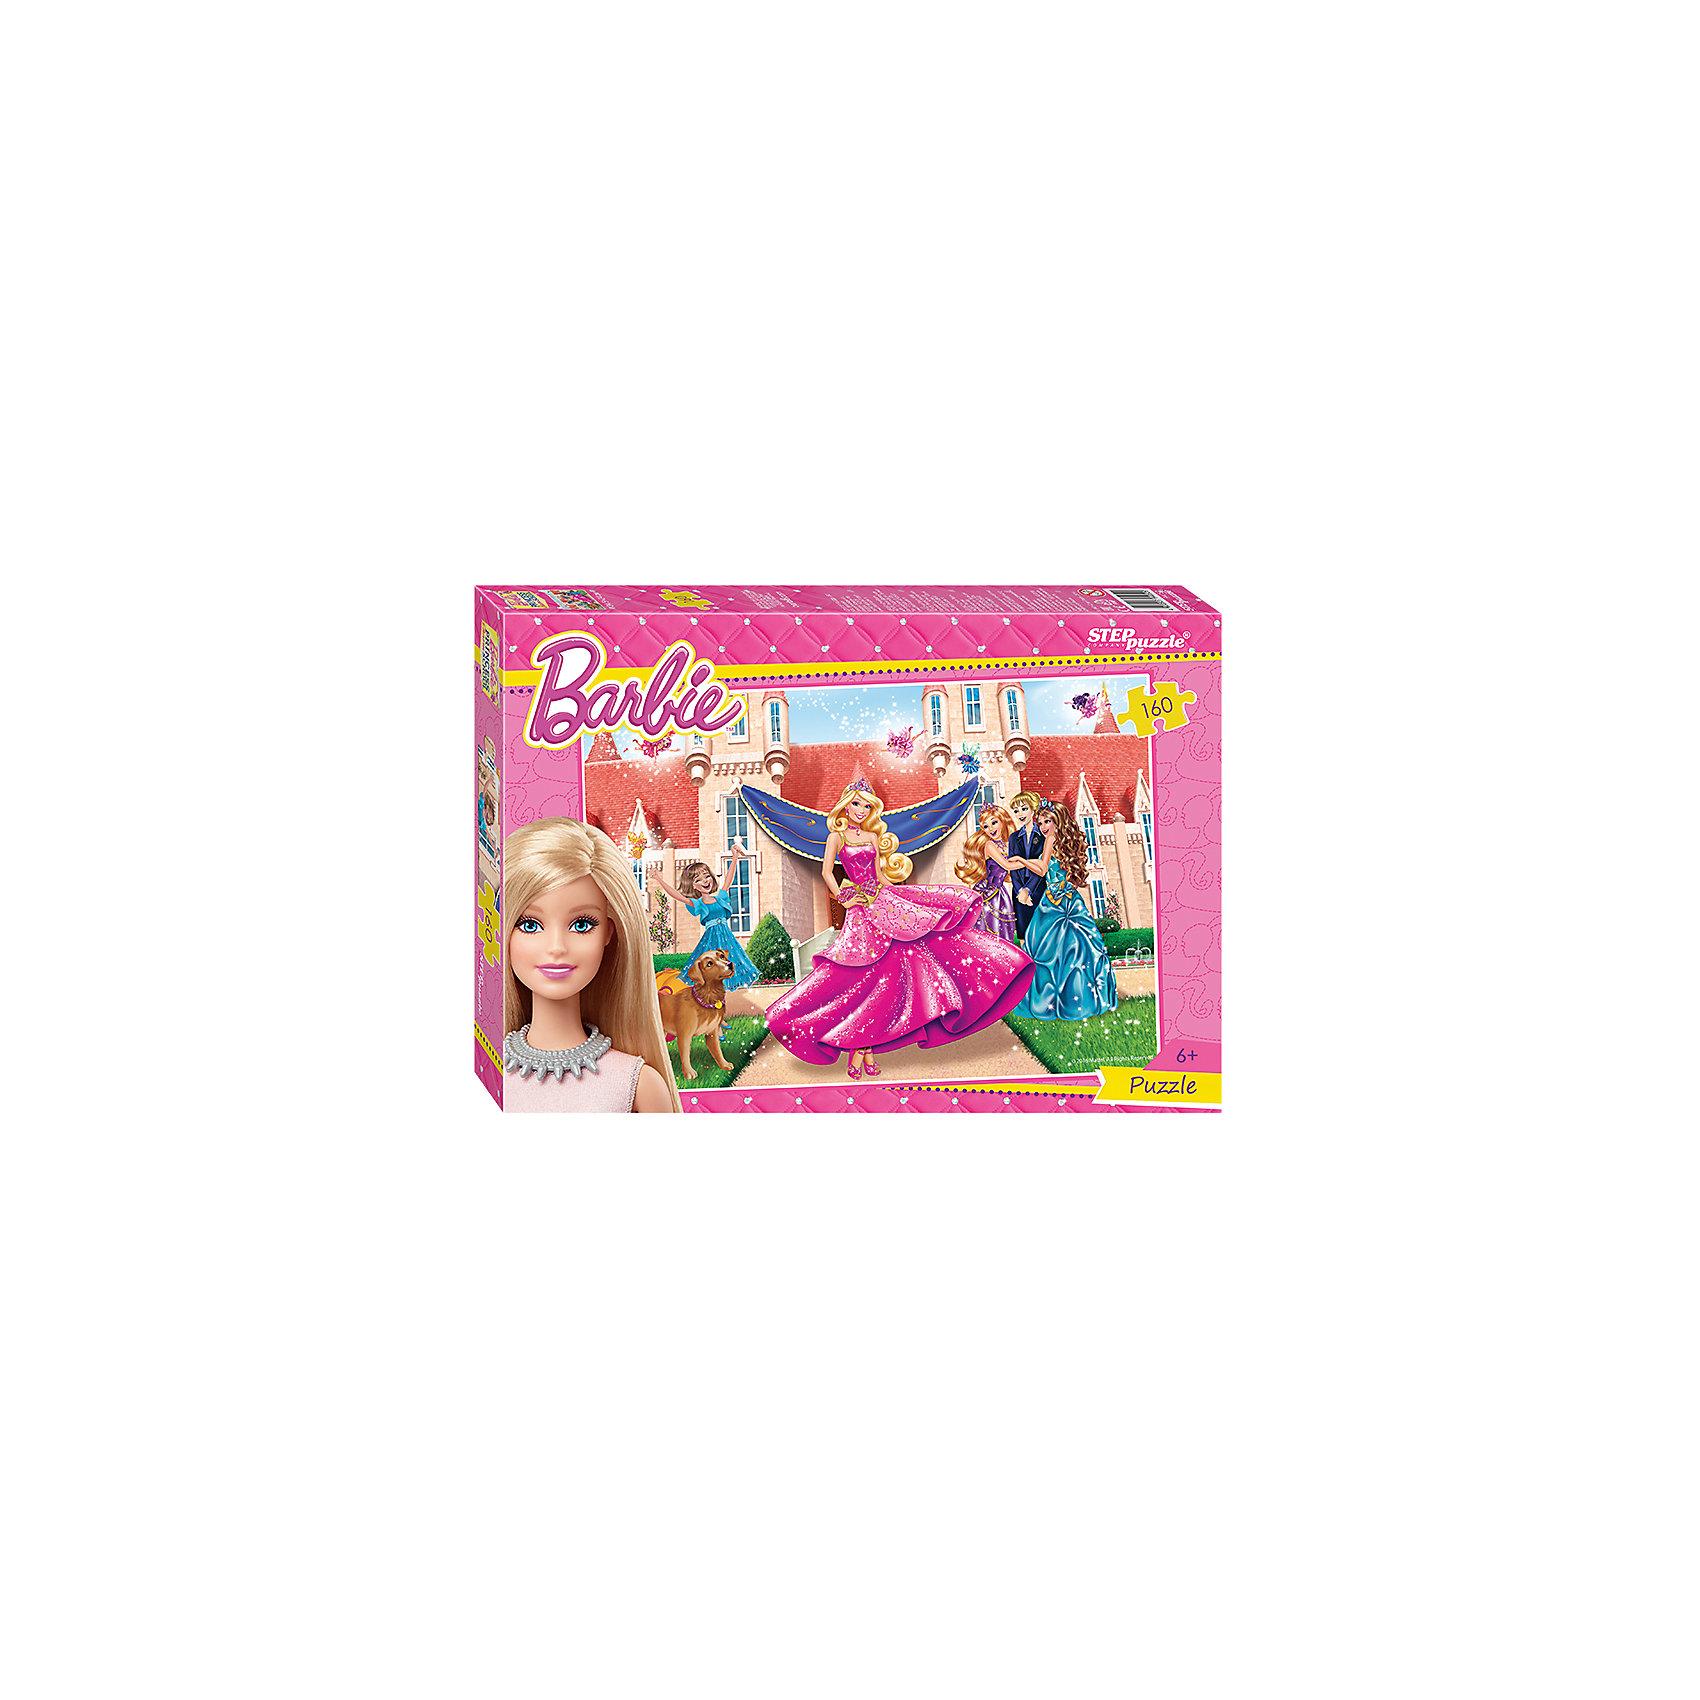 Степ Пазл Пазл Барби, 160 деталей, Step Puzzle пазлы step puzzle пазл винни и его друзья 160 элементов